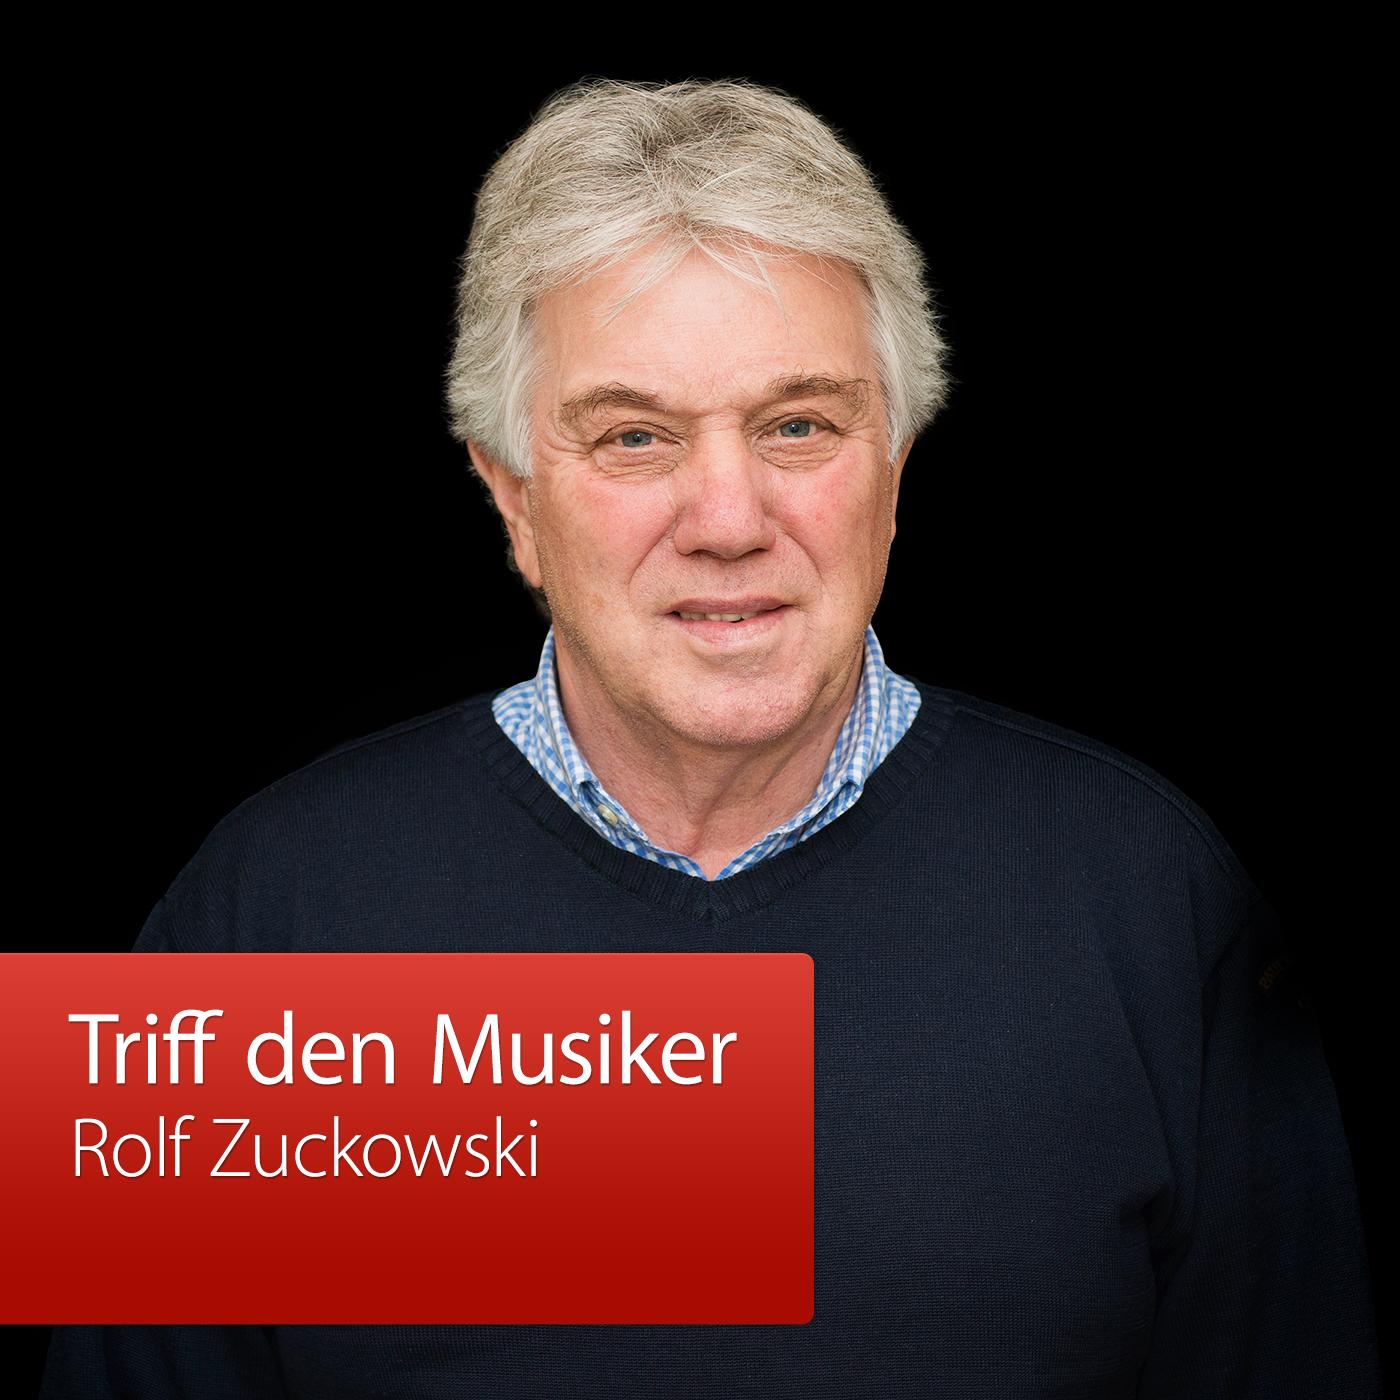 Rolf Zuckowski: Triff den Musiker